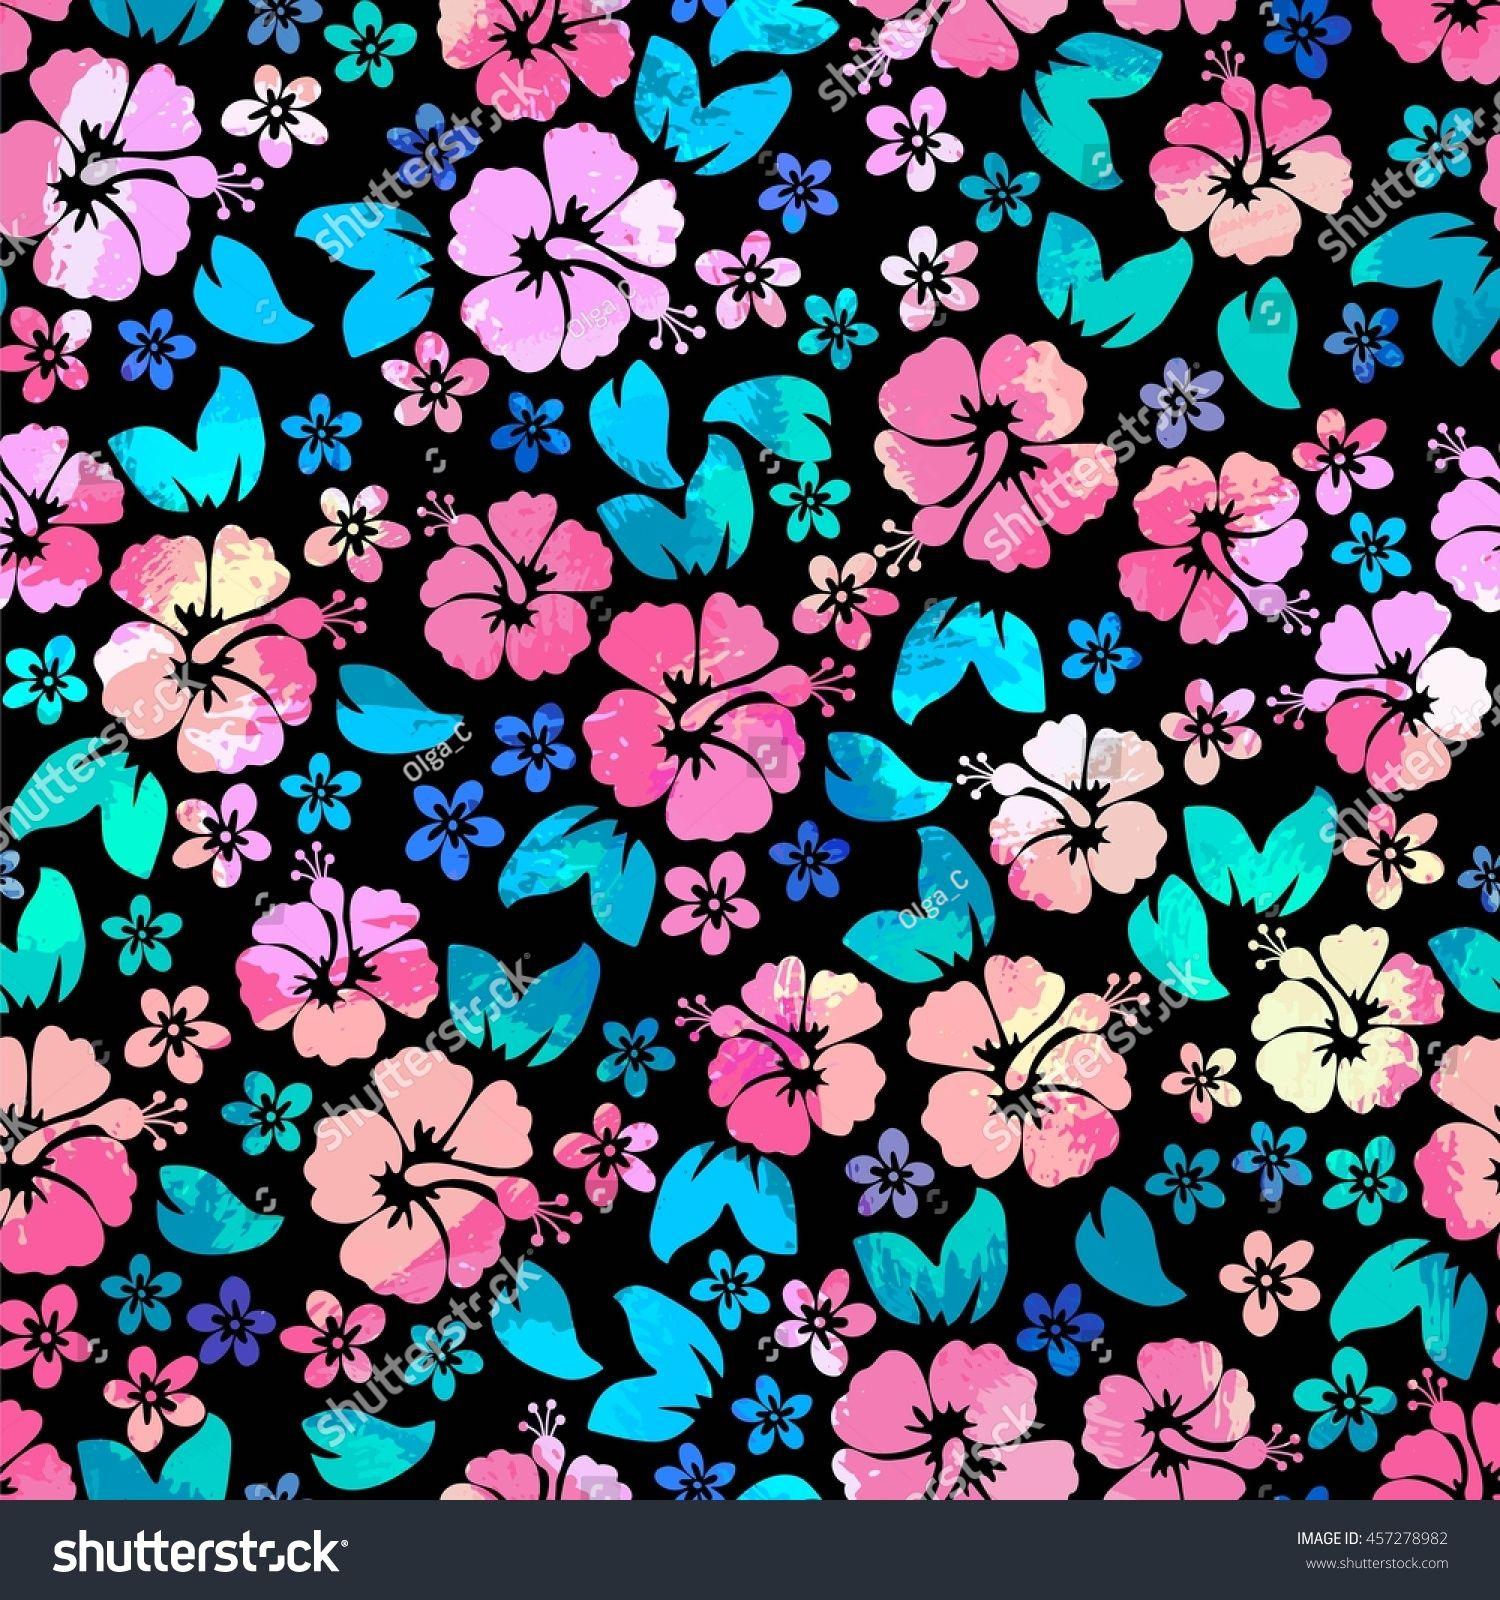 673e47005743 Hibiscus Flowers Seamless Pattern. Hawaiian Aloha Shirt Seamless Background.